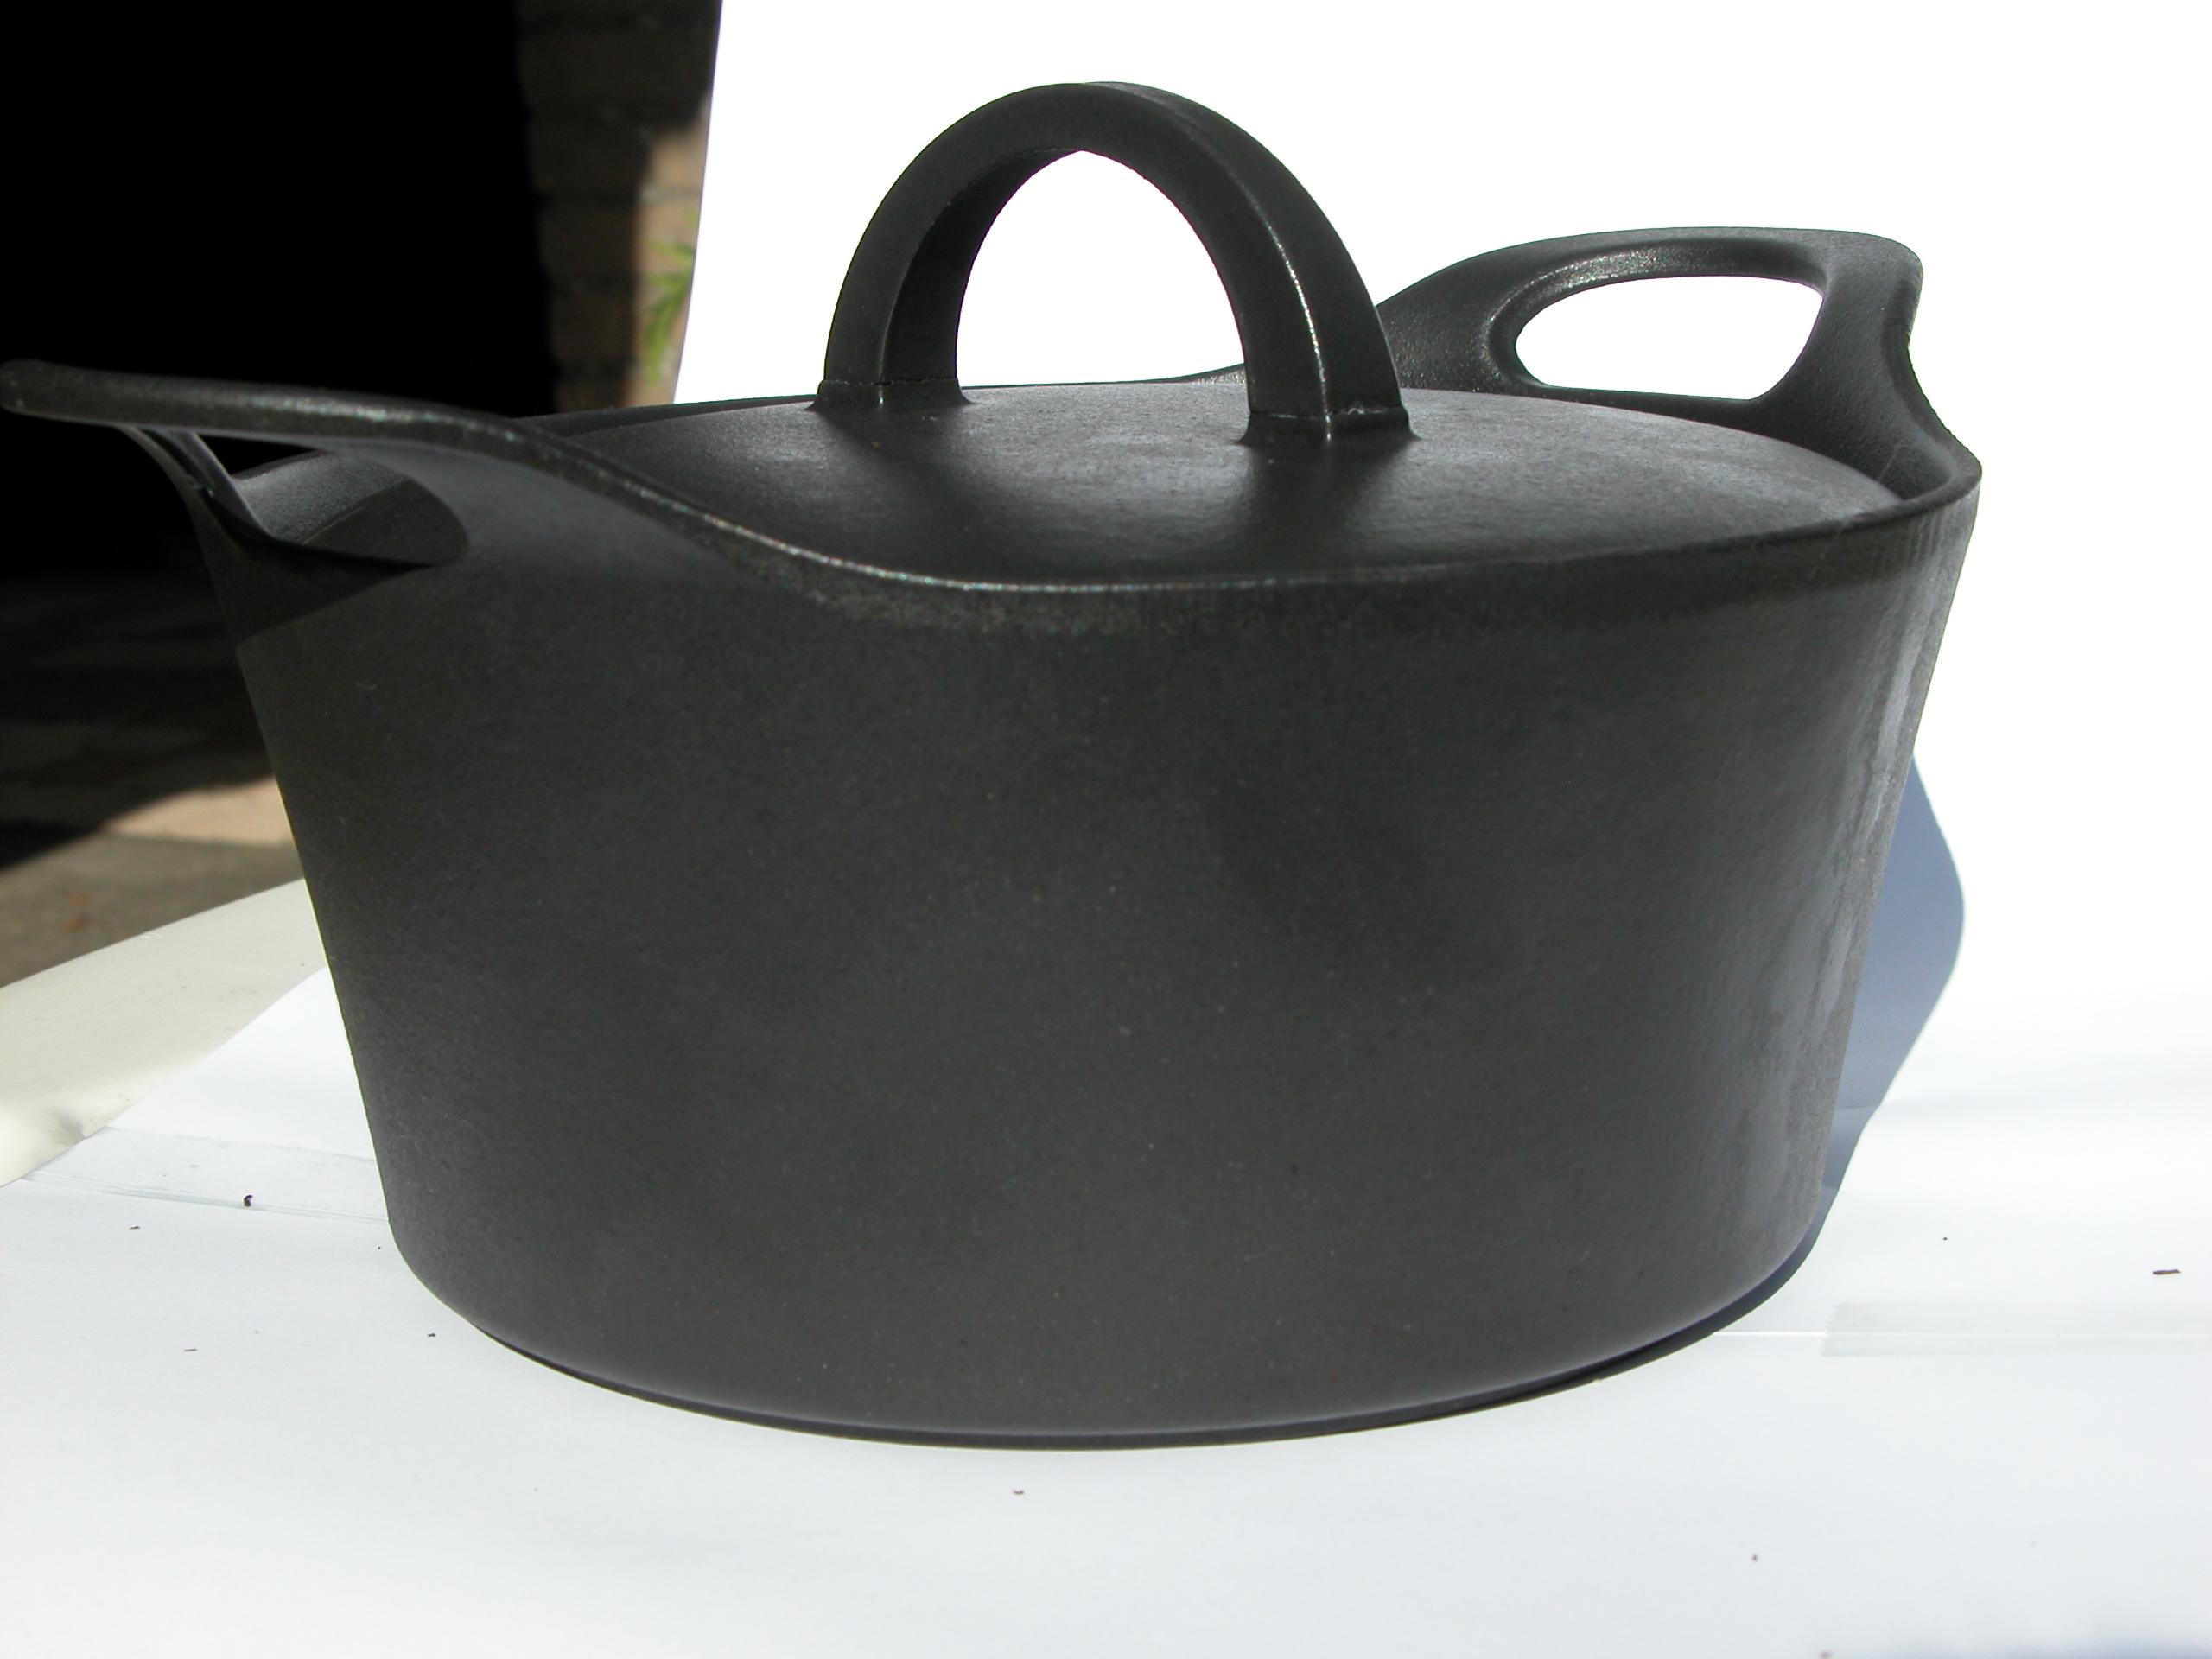 pot calling the kettle black heavy wrought-iron dark